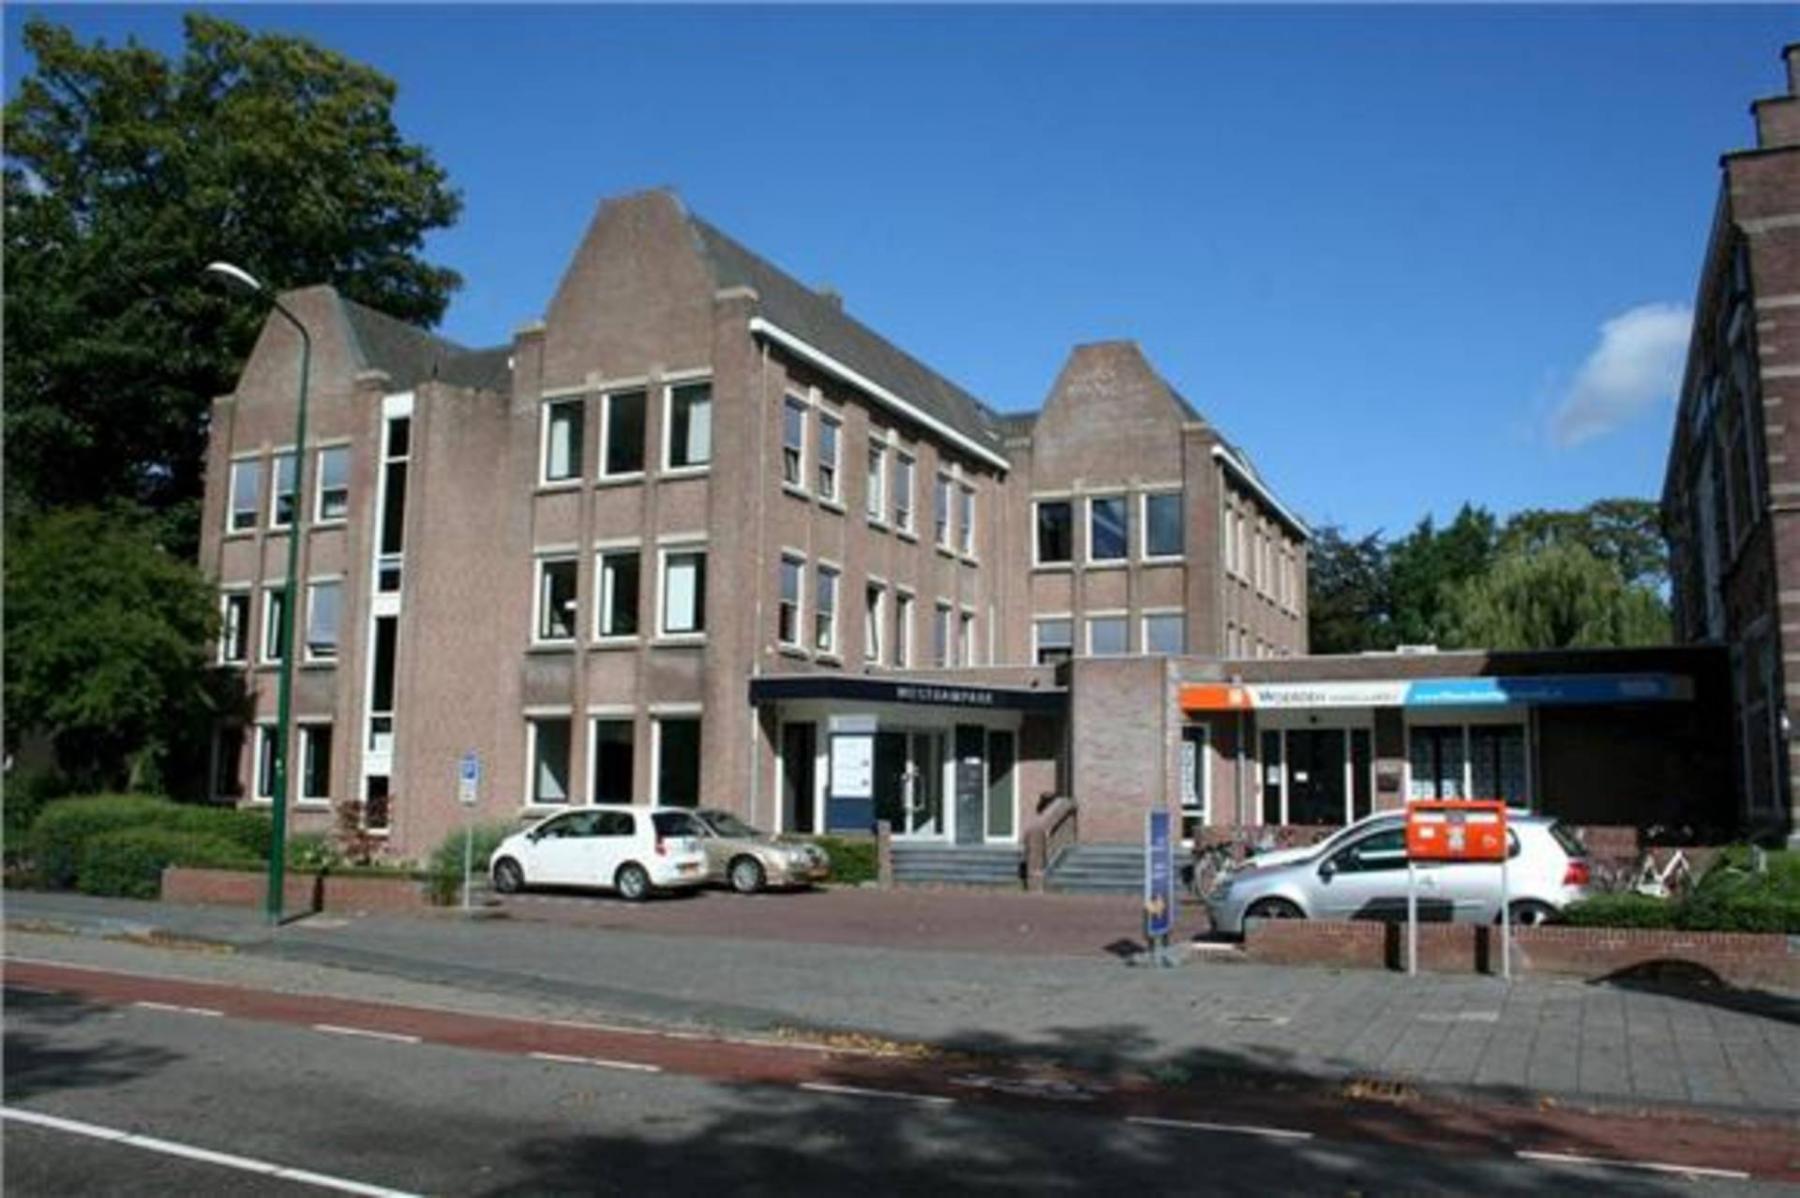 Westdam 3AB - Woerden